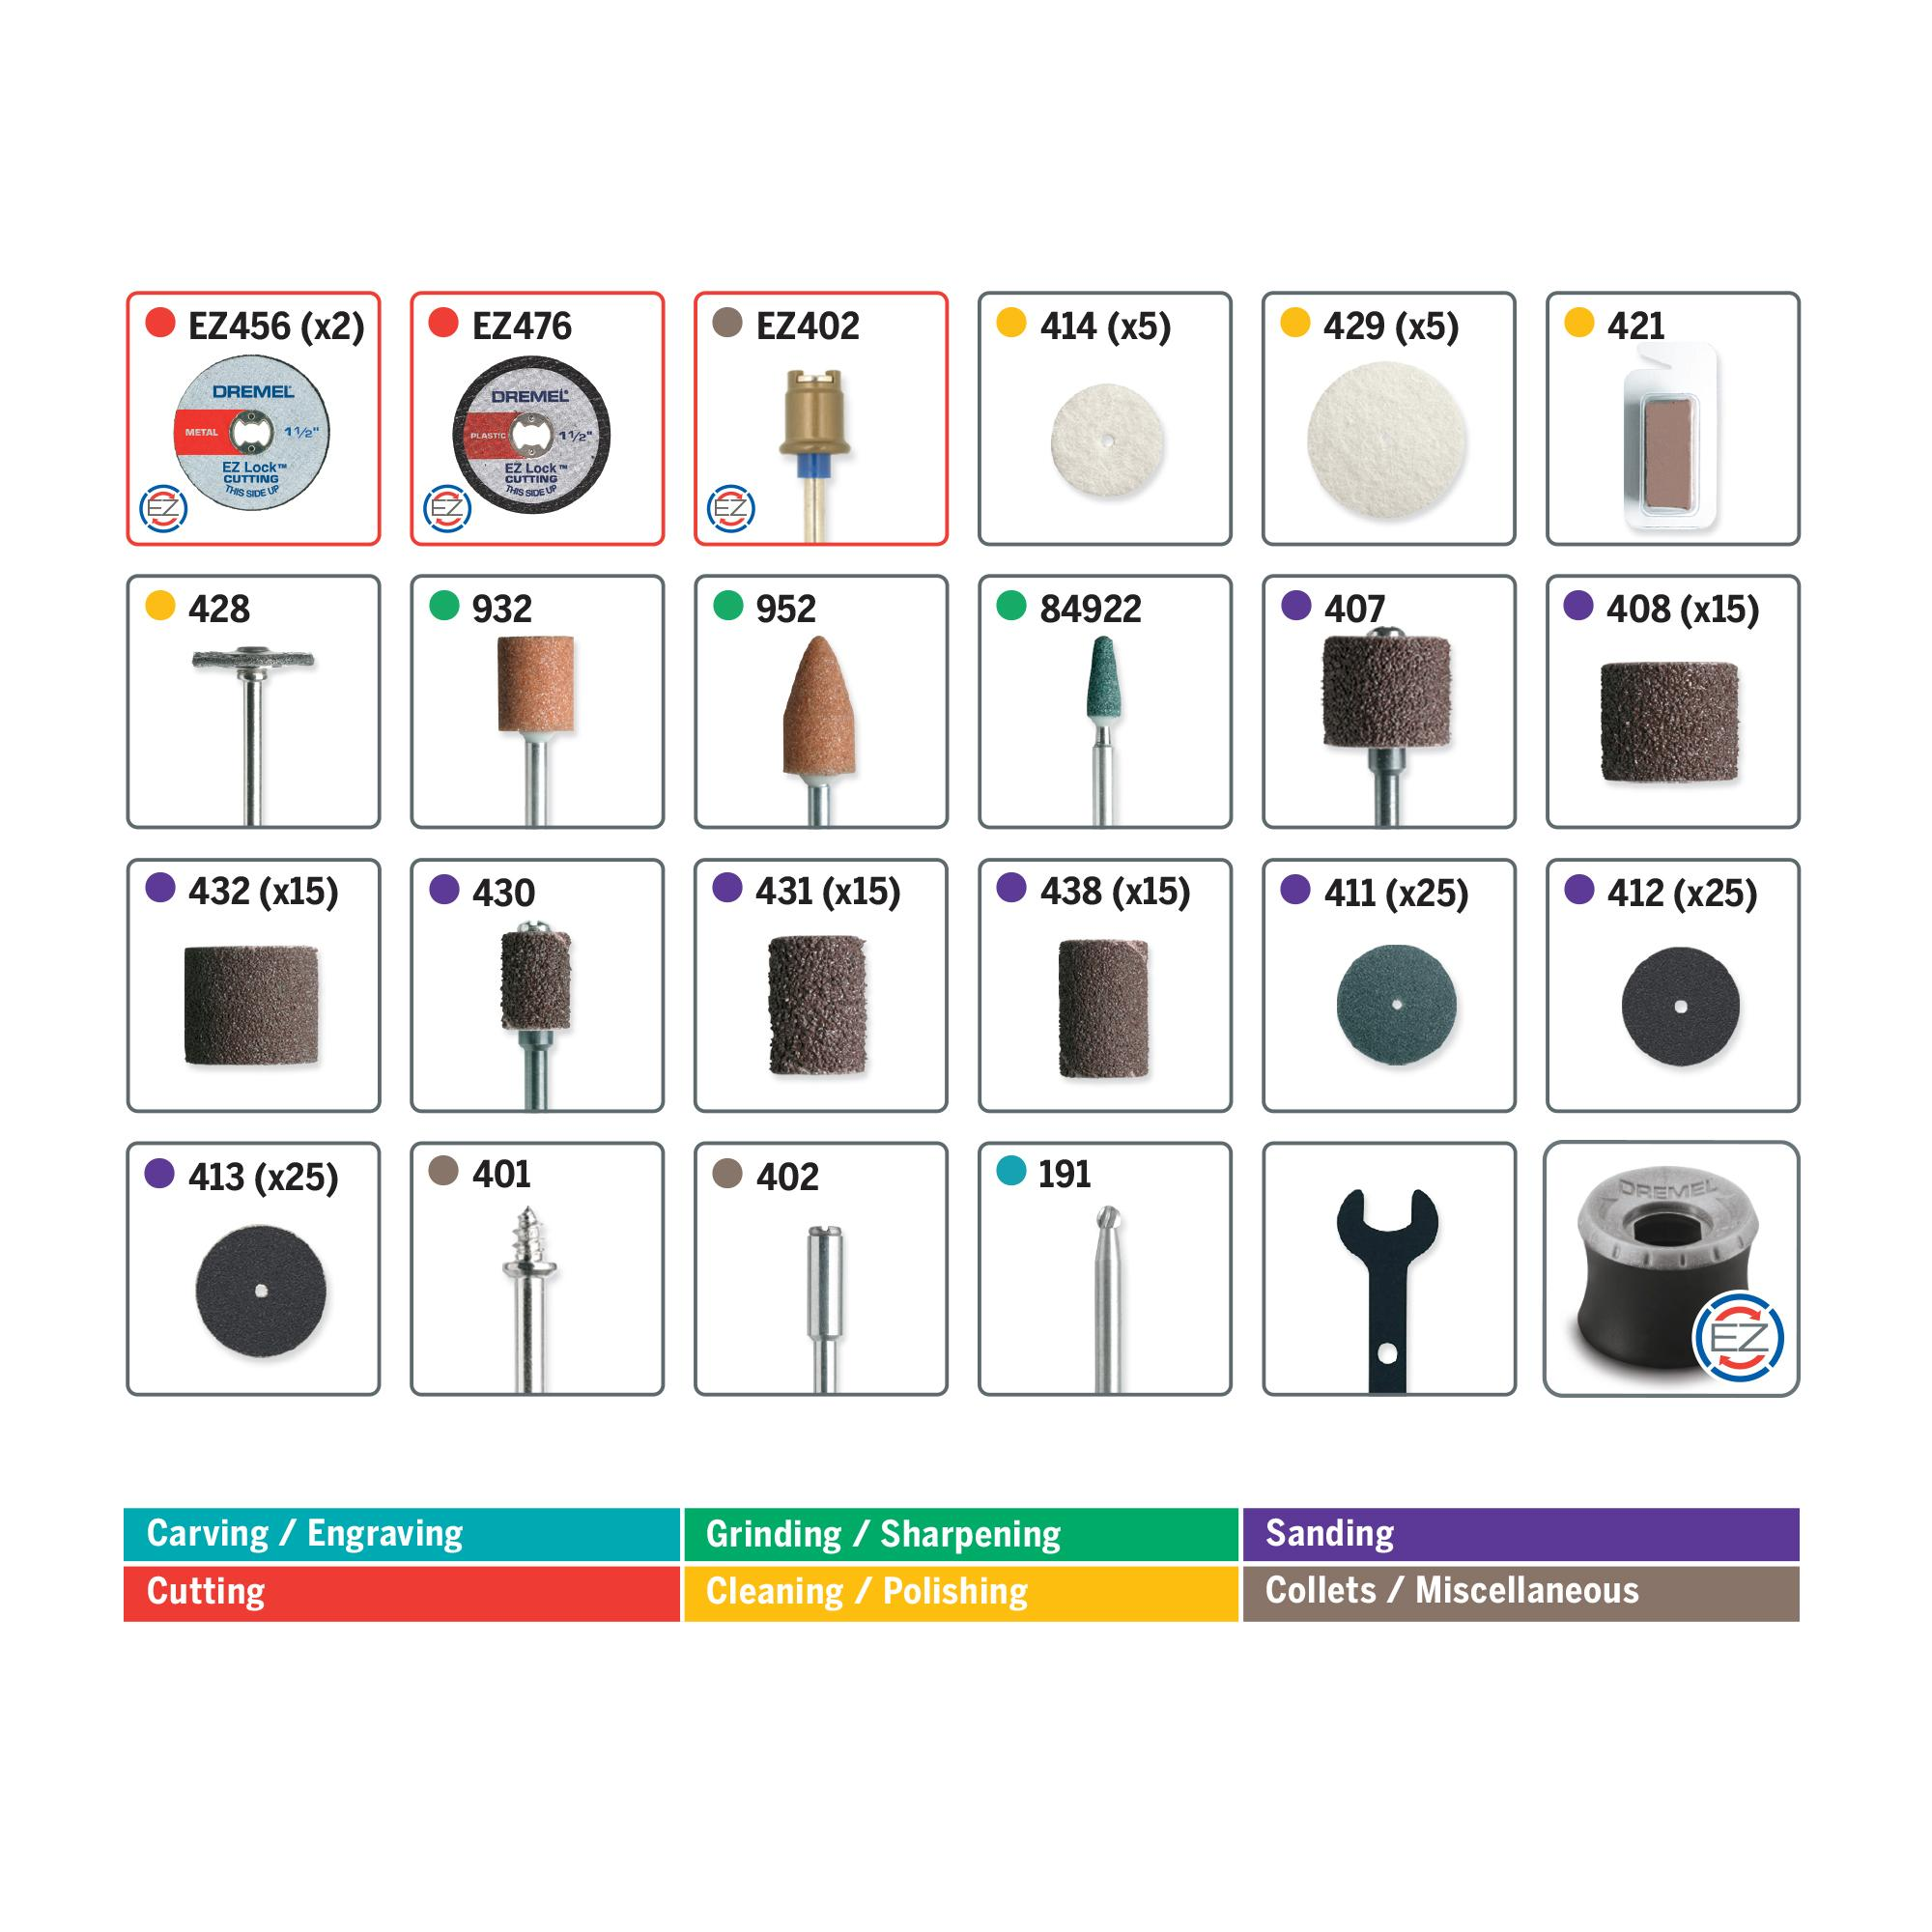 Dremel 710-08 All-Purpose Rotary Accessory Kit, 160-Piece - - Amazon.com